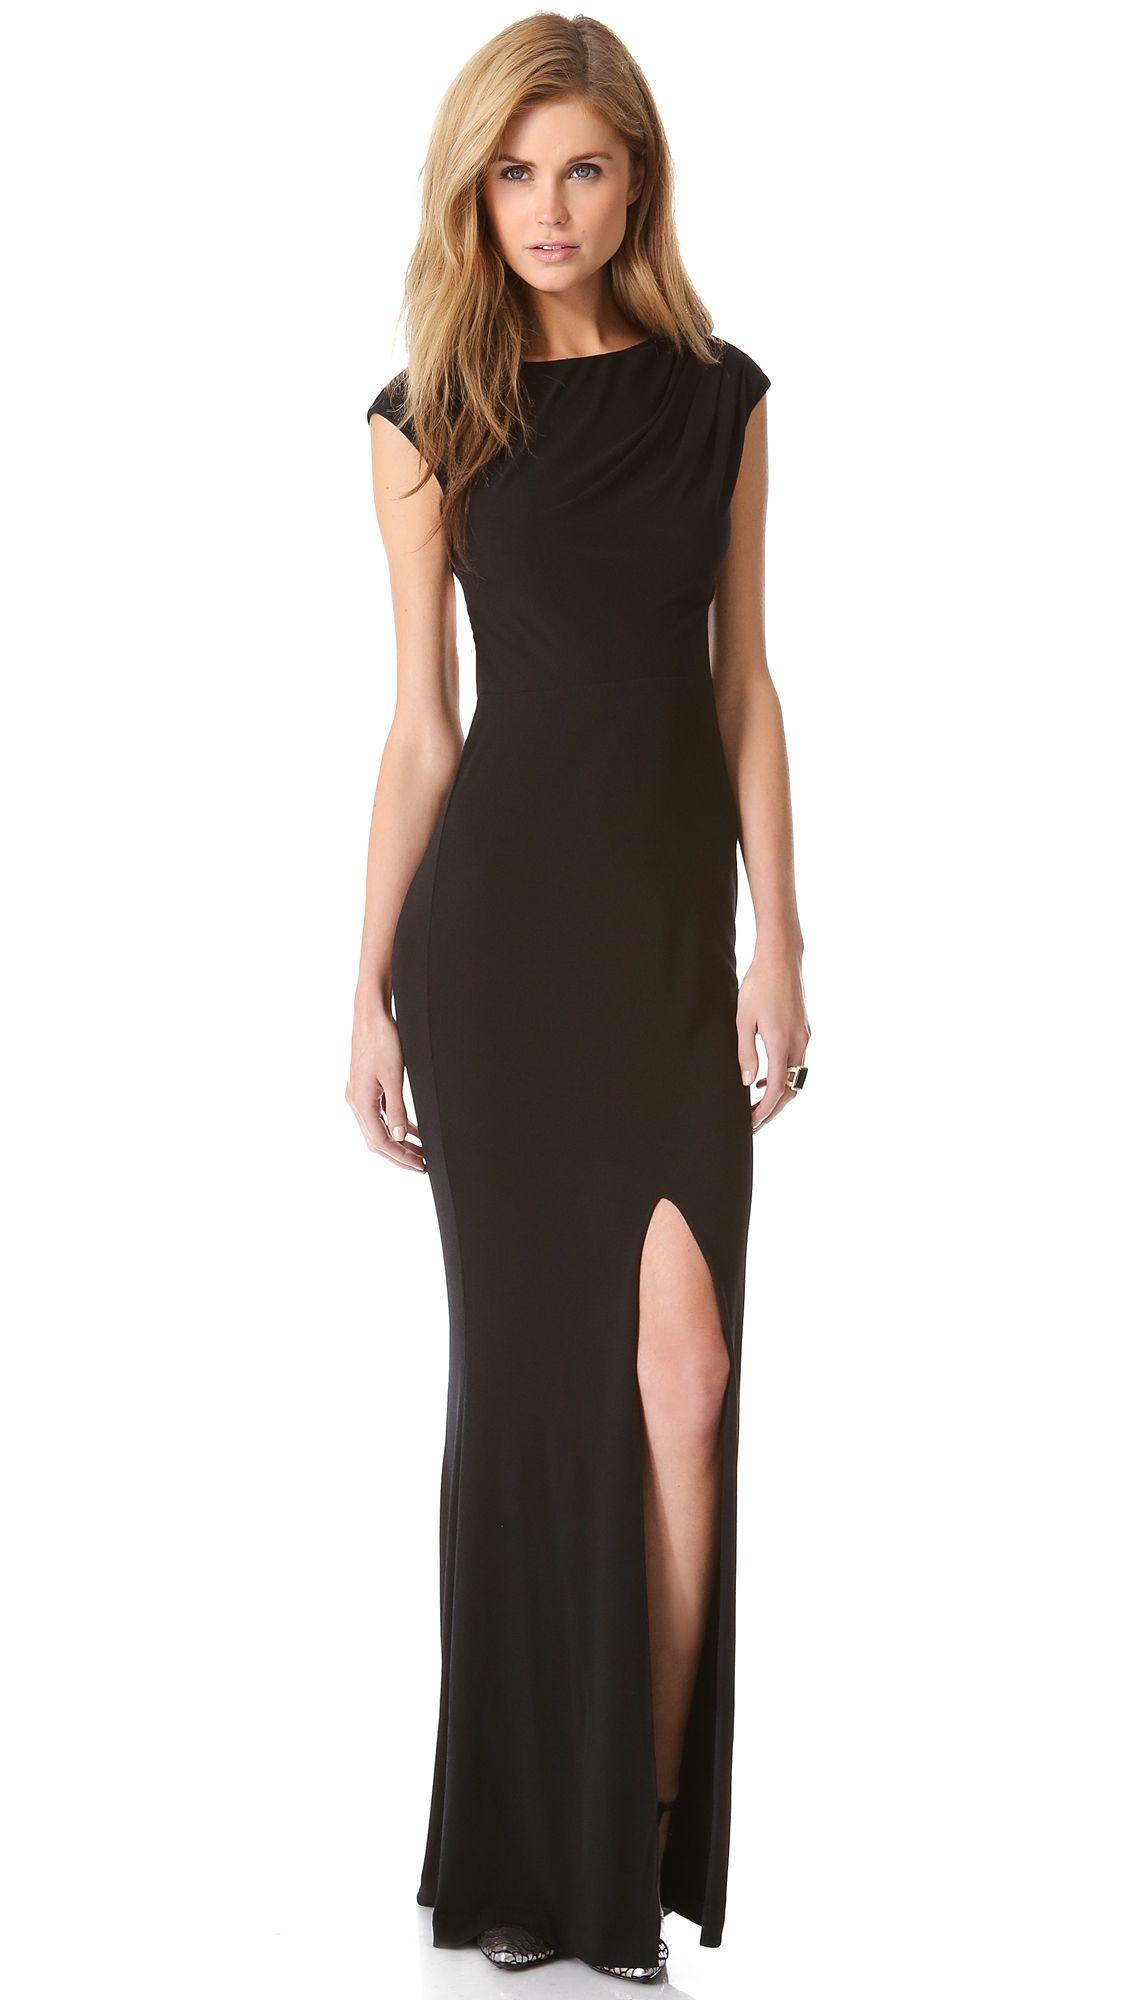 Adriana II Mermaid Maxi Dress